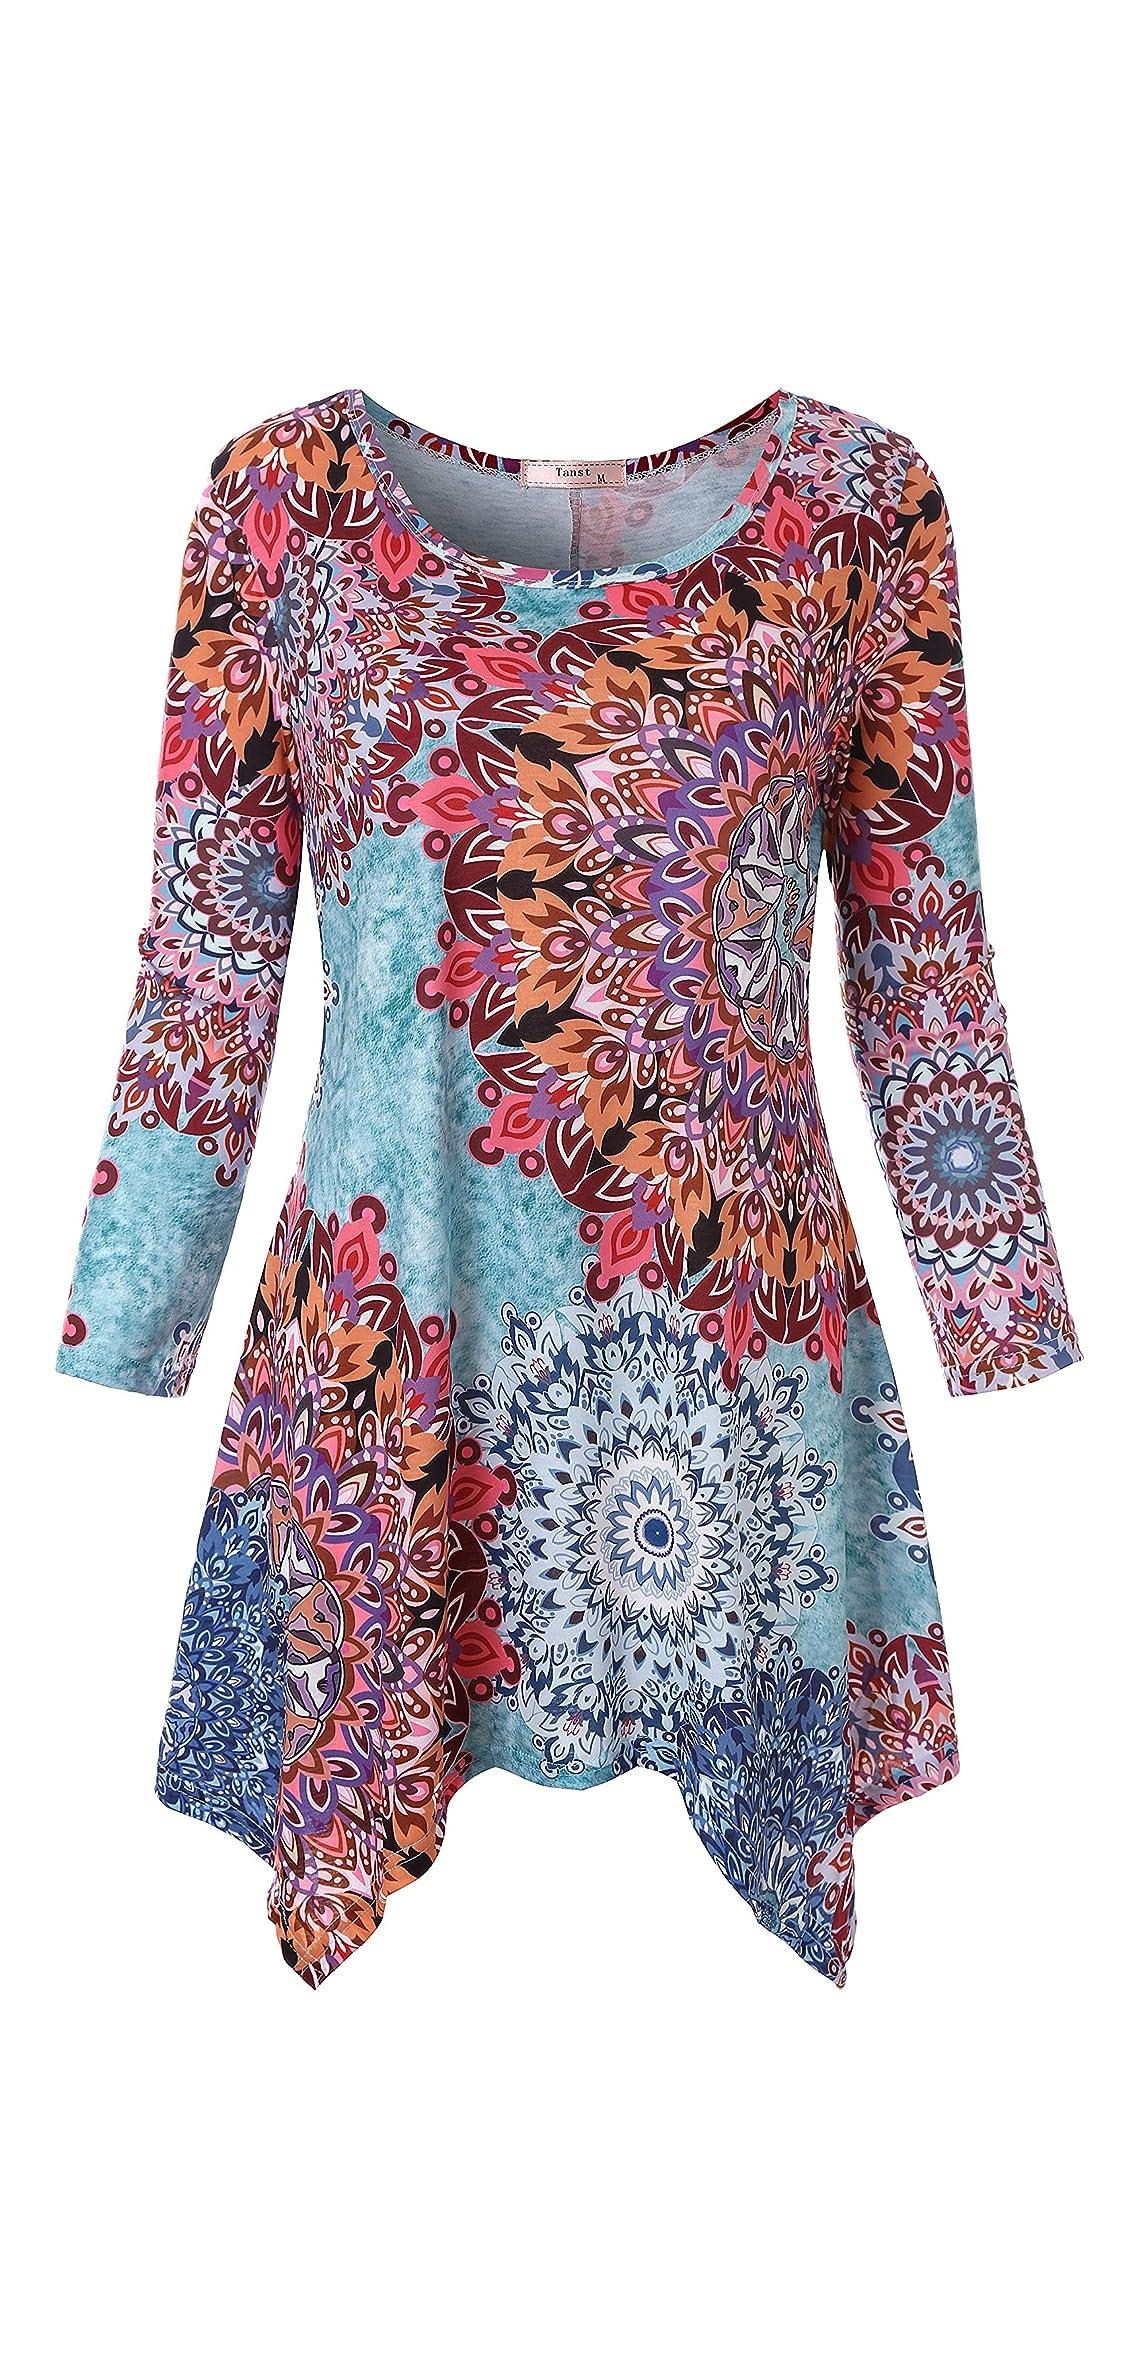 Womens Casual Floral Print / Sleeve Shirt Asymmetrical